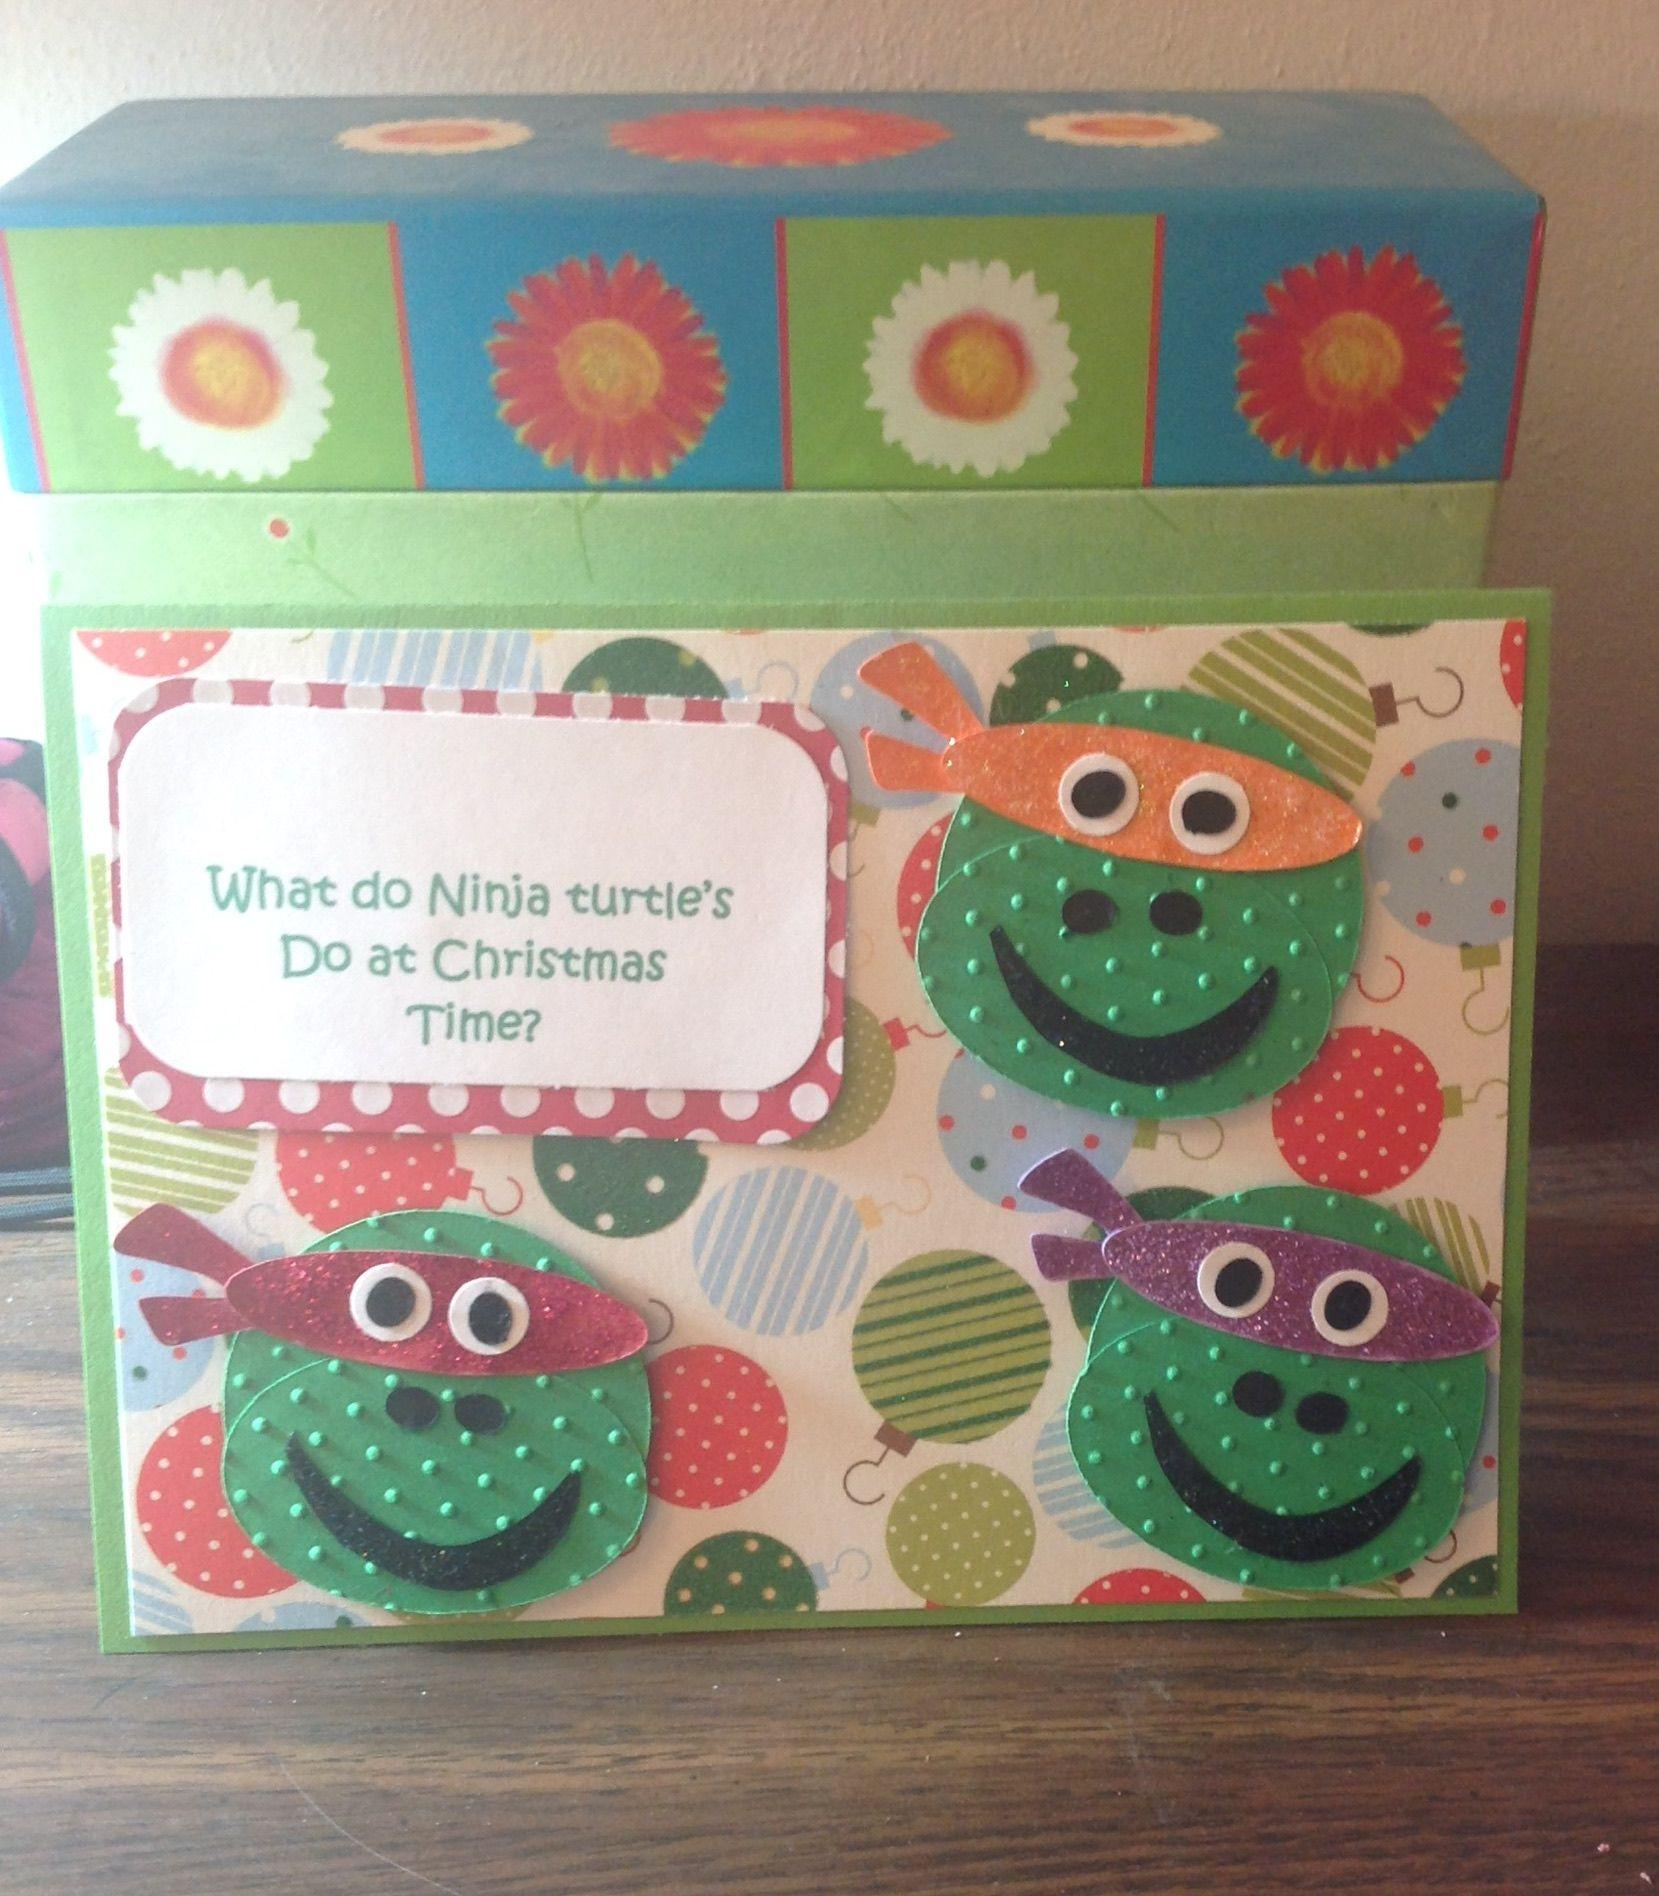 Ninja turtle cricut card